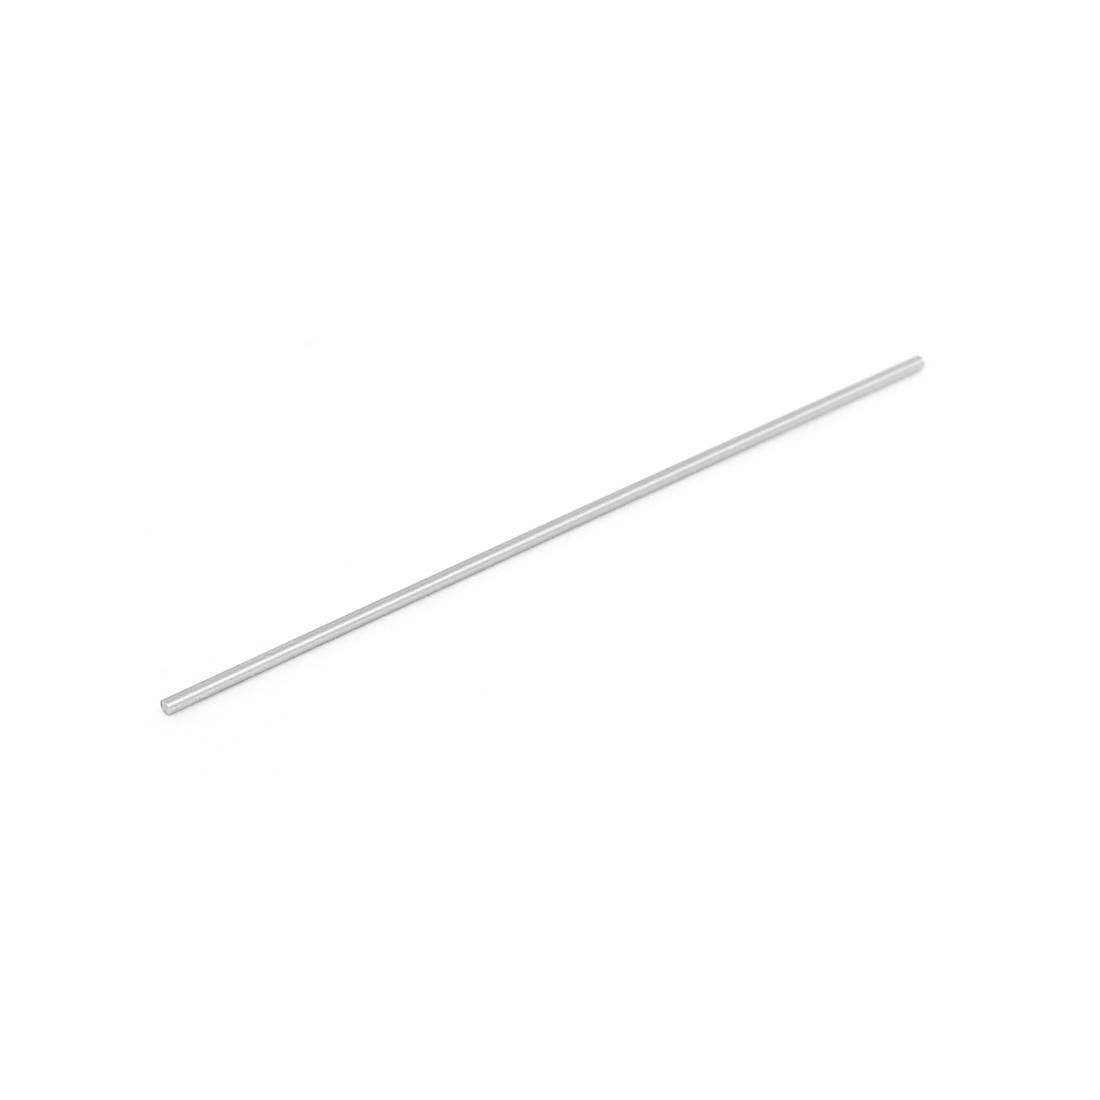 0.9mm Diameter 50mm Length Tungsten Carbide Pin Gage Gauge